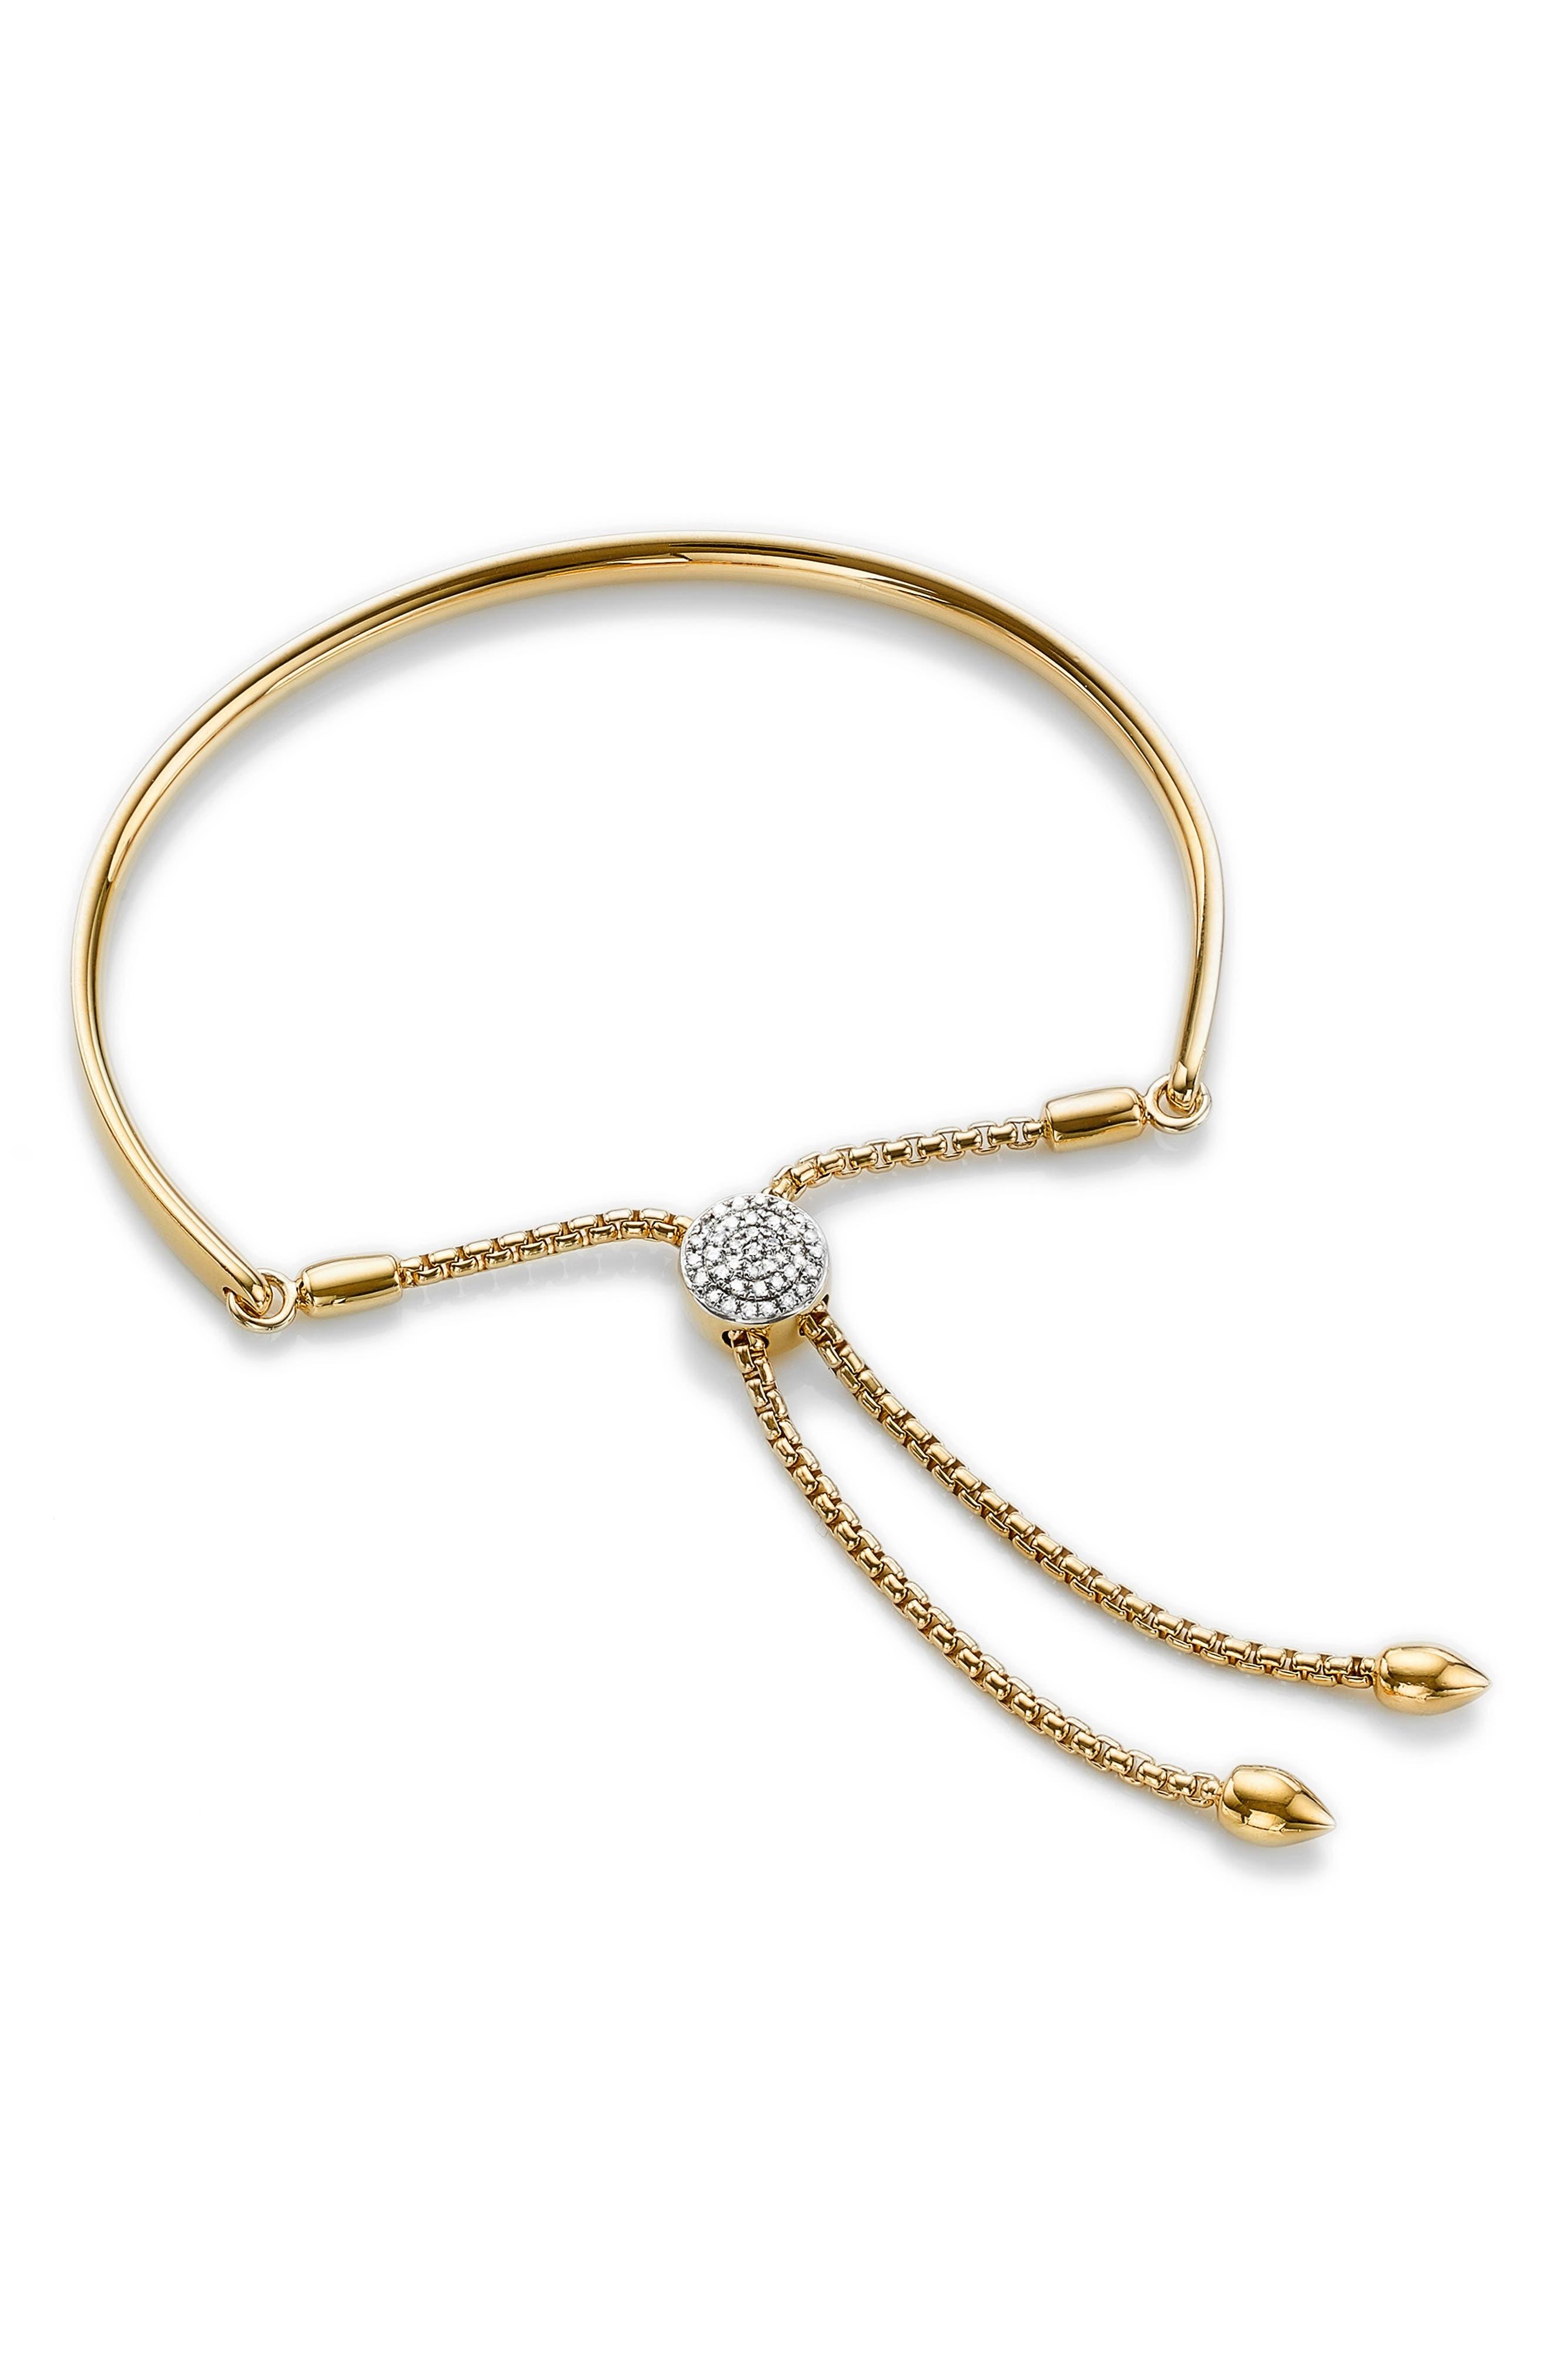 Main Image - Monica Vinader Fiji Diamond Toggle Bracelet